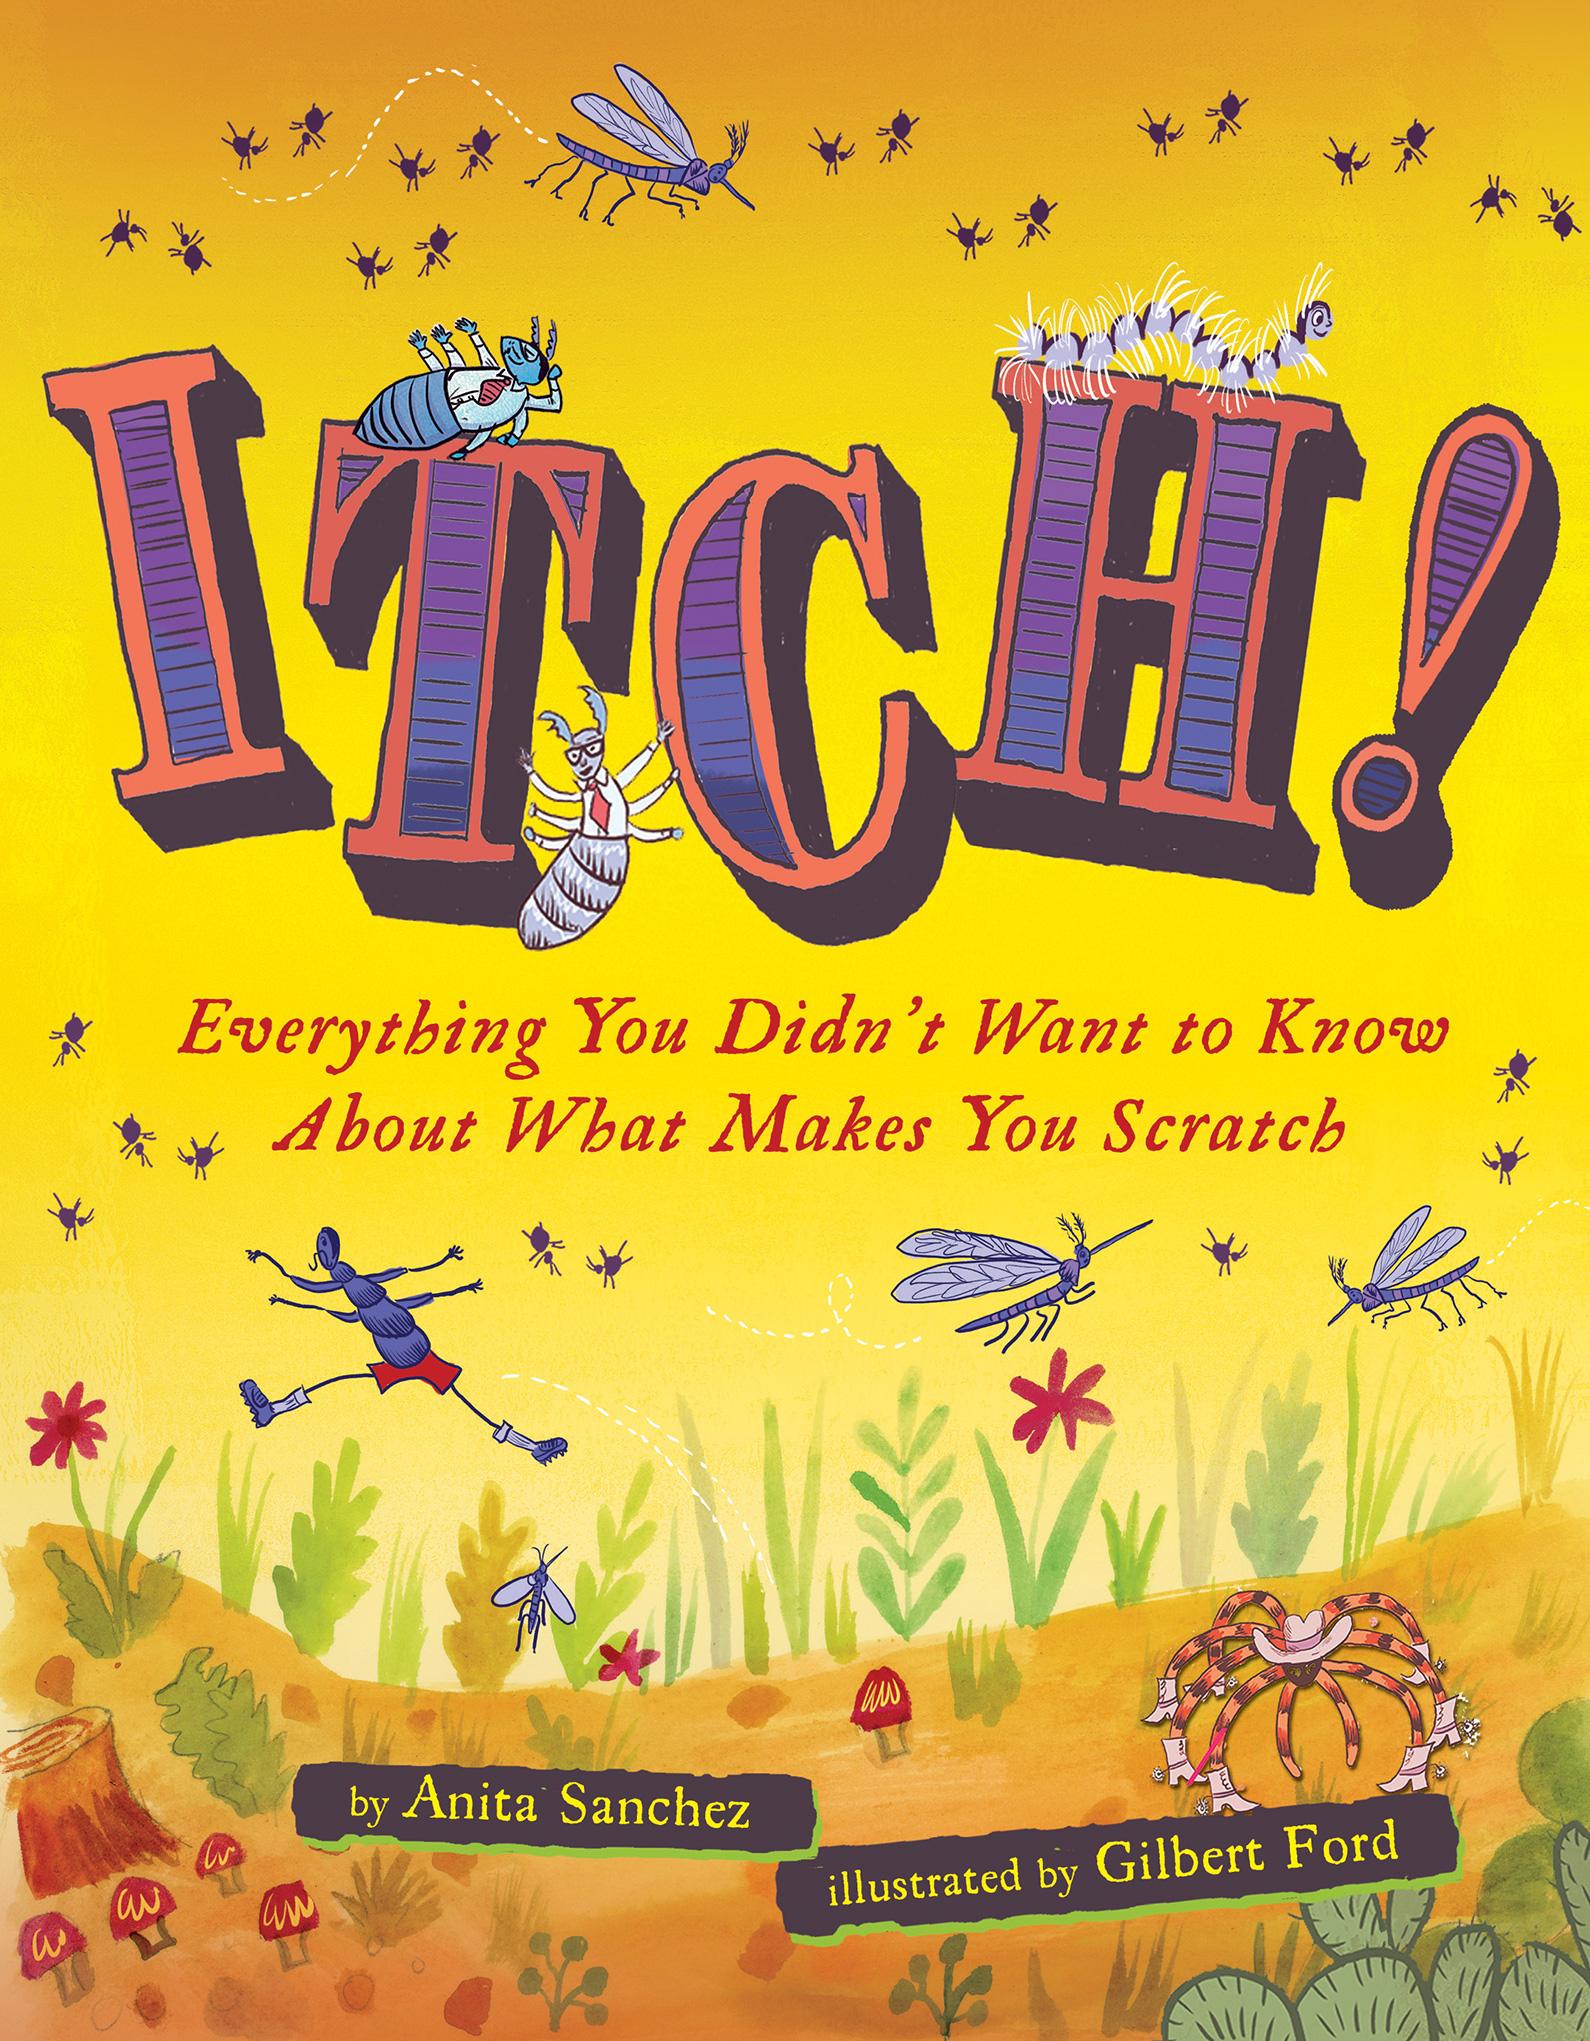 Itch.jpg